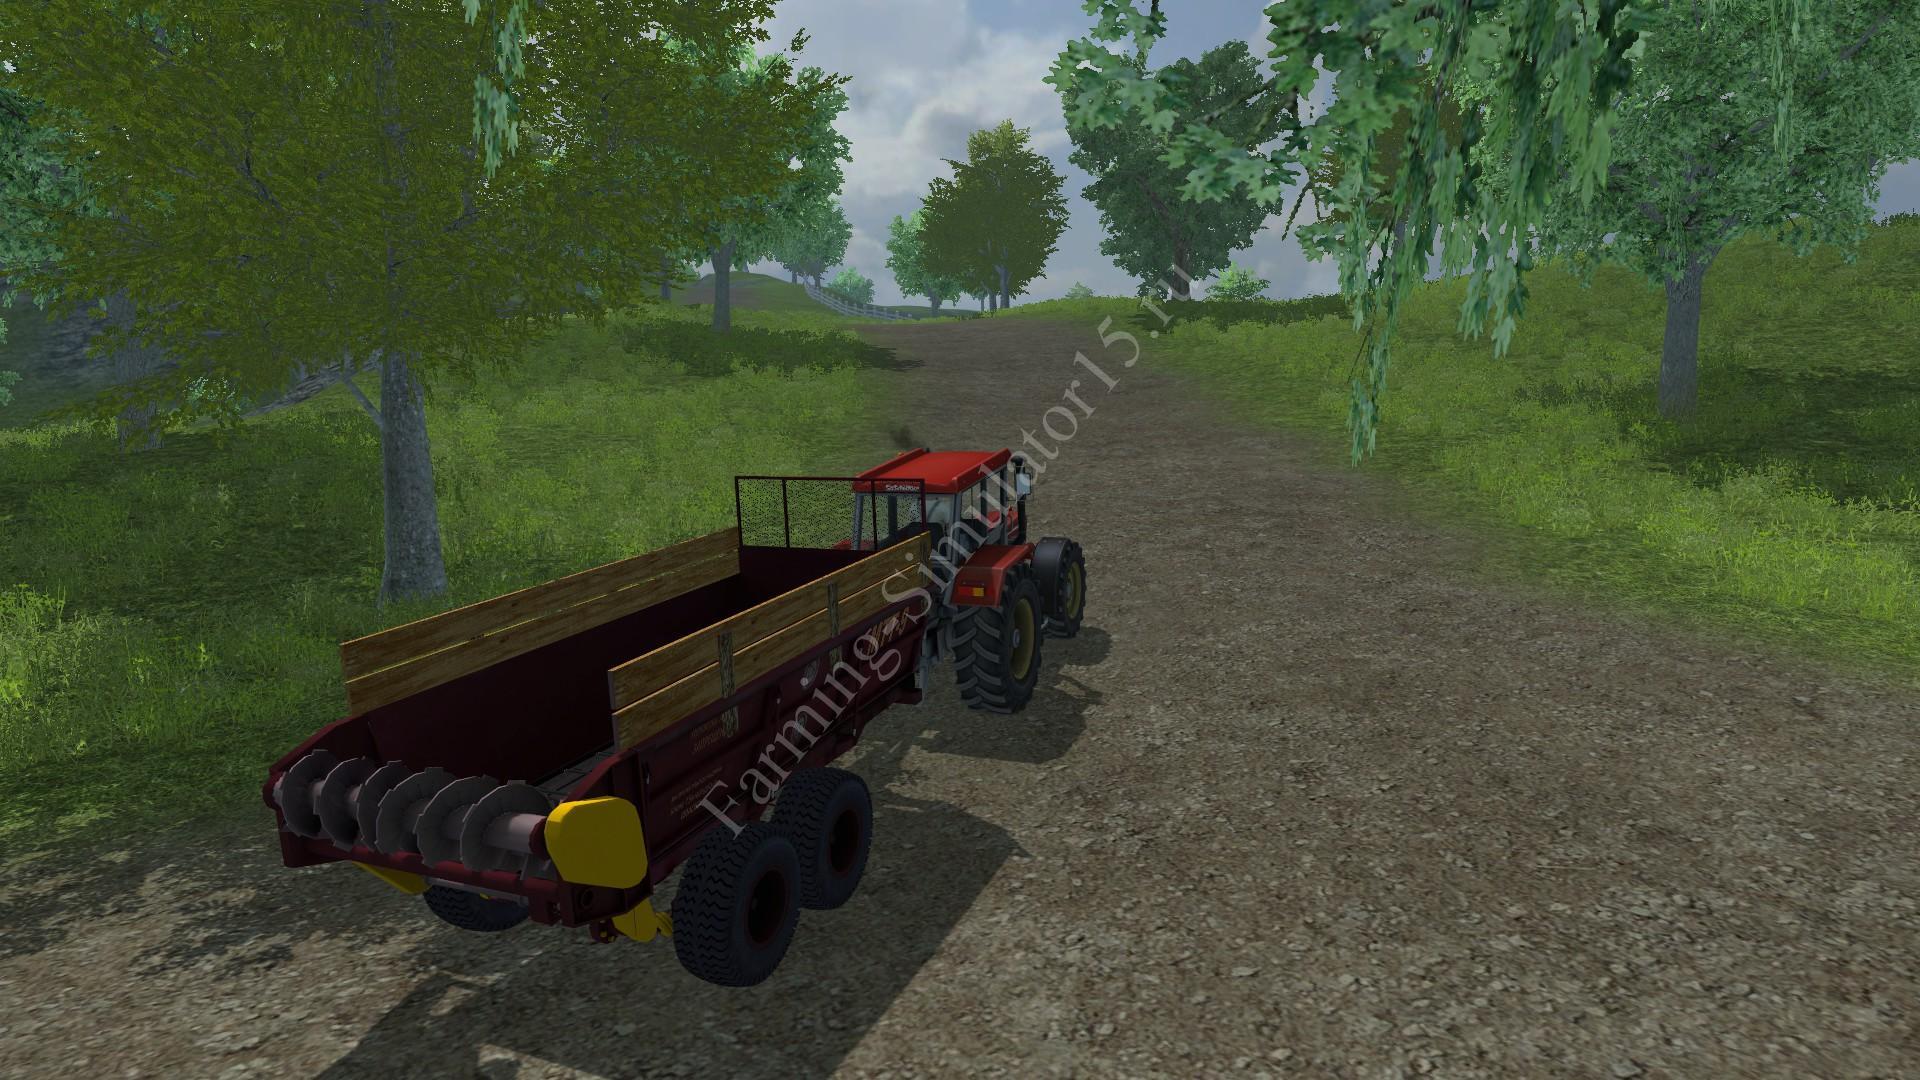 Мод прицепа для удобрений MTT 9 v 1.0 Farming Simulator 2013, Farming Simulator 13